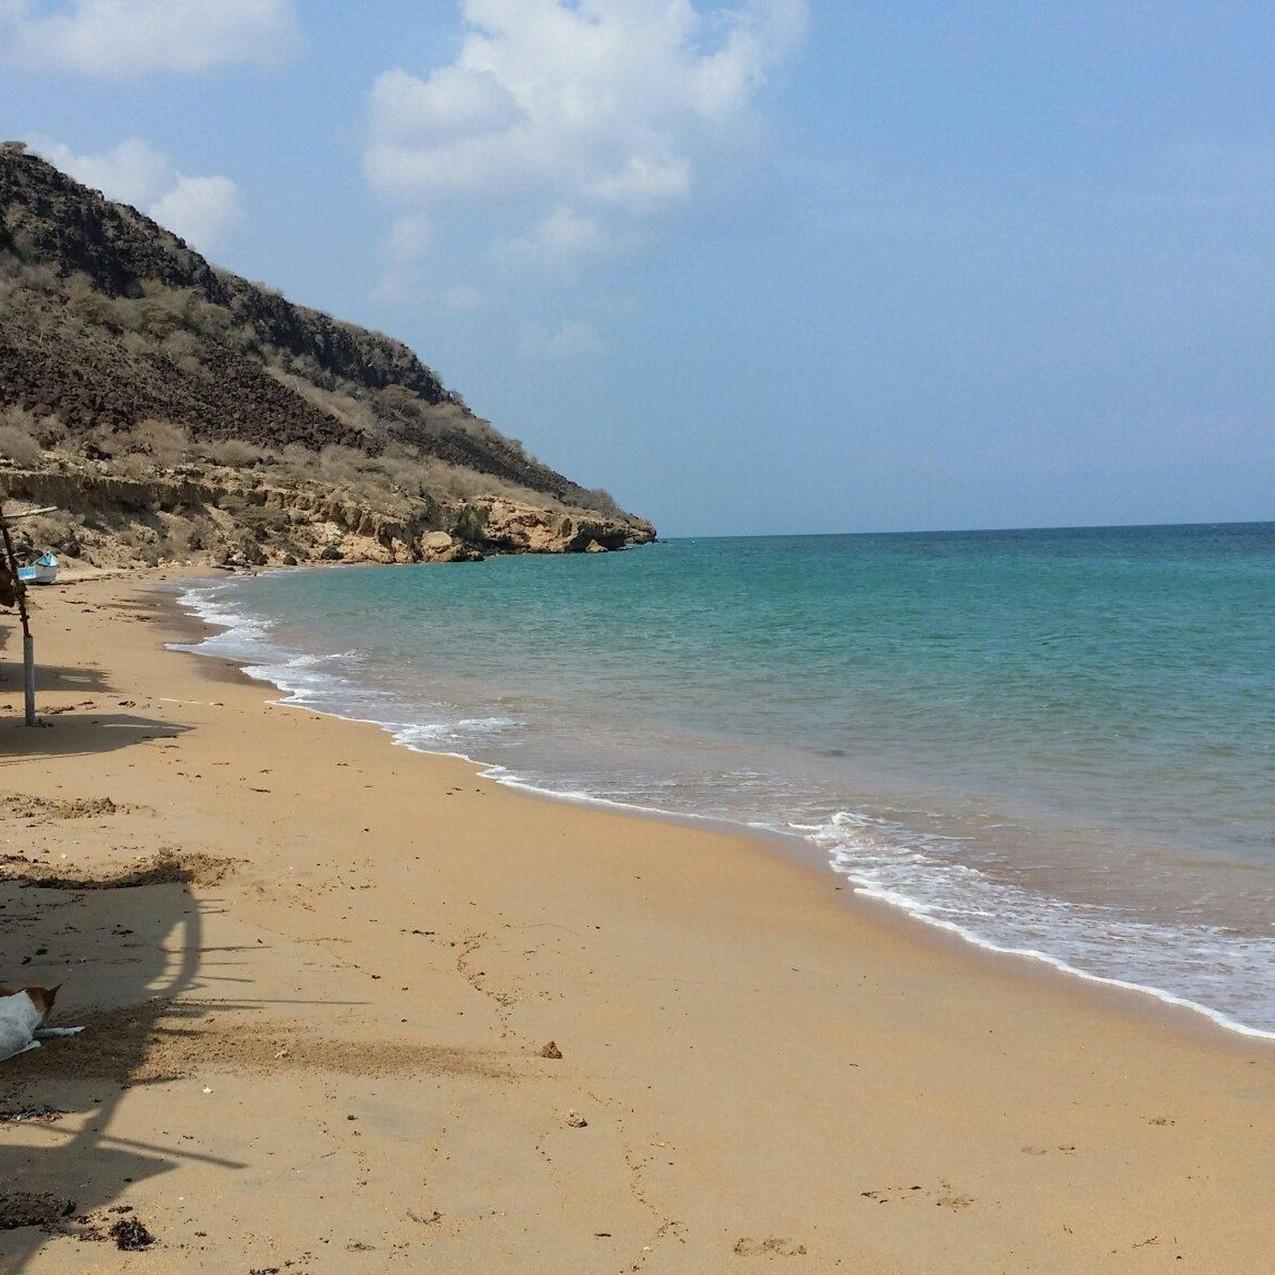 Khor Ambado Beach